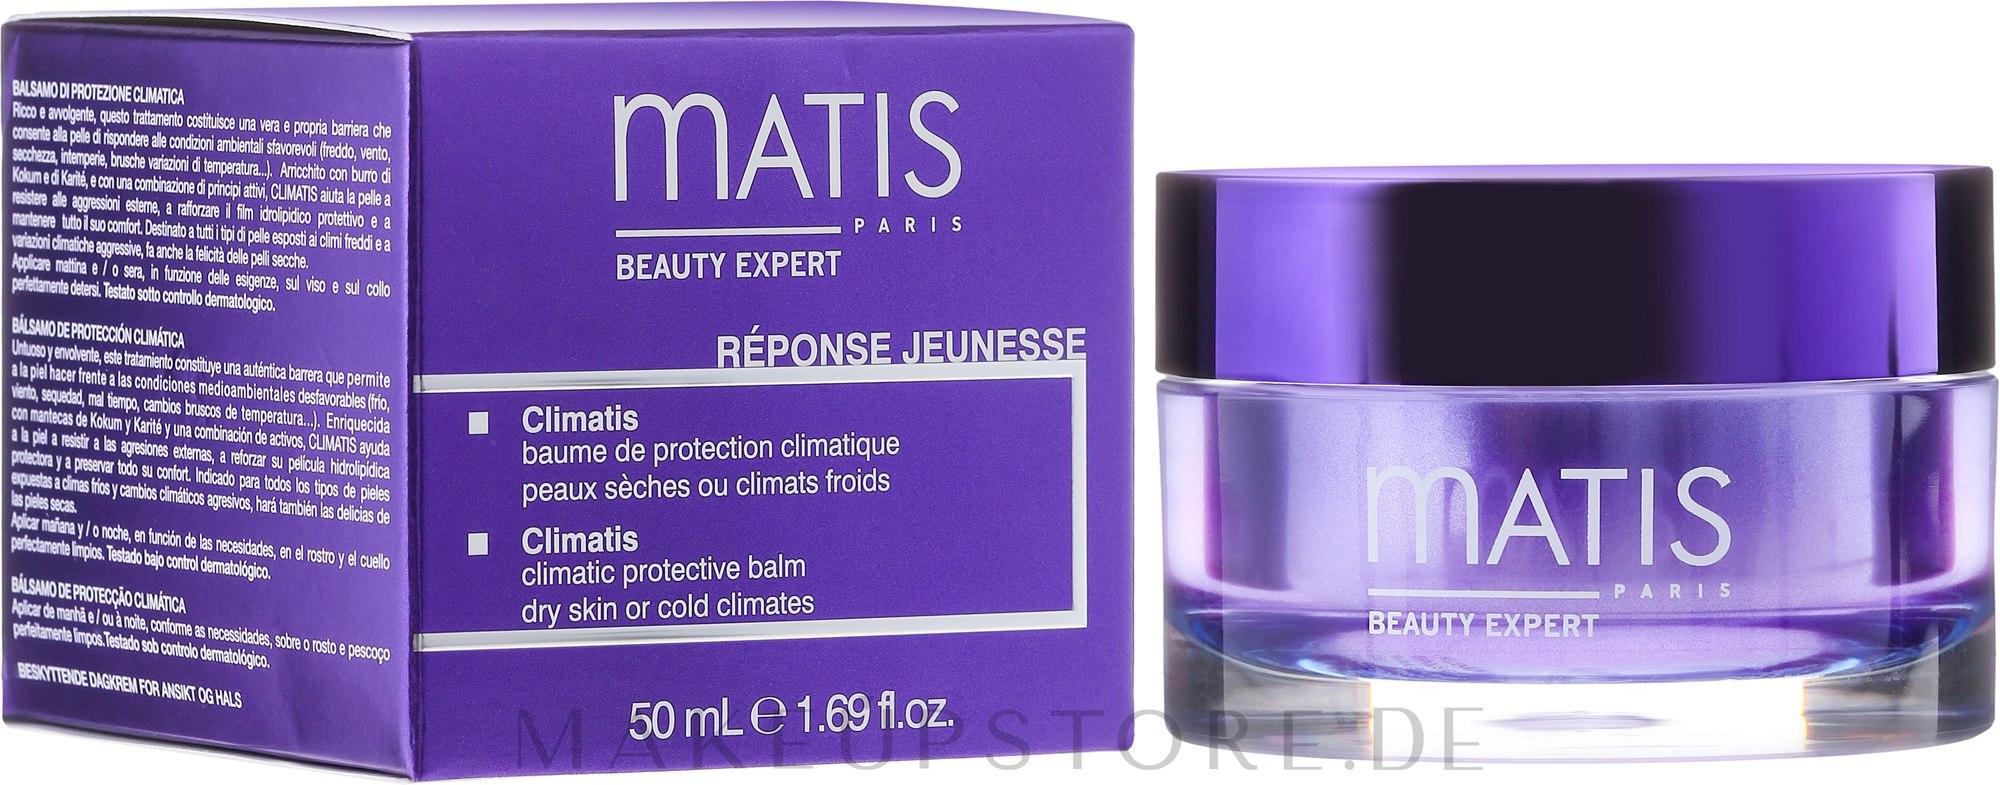 Gesichtsschutzbalsam - Matis Reponse Jeunesse Climatis Protective Balm — Bild 50 ml